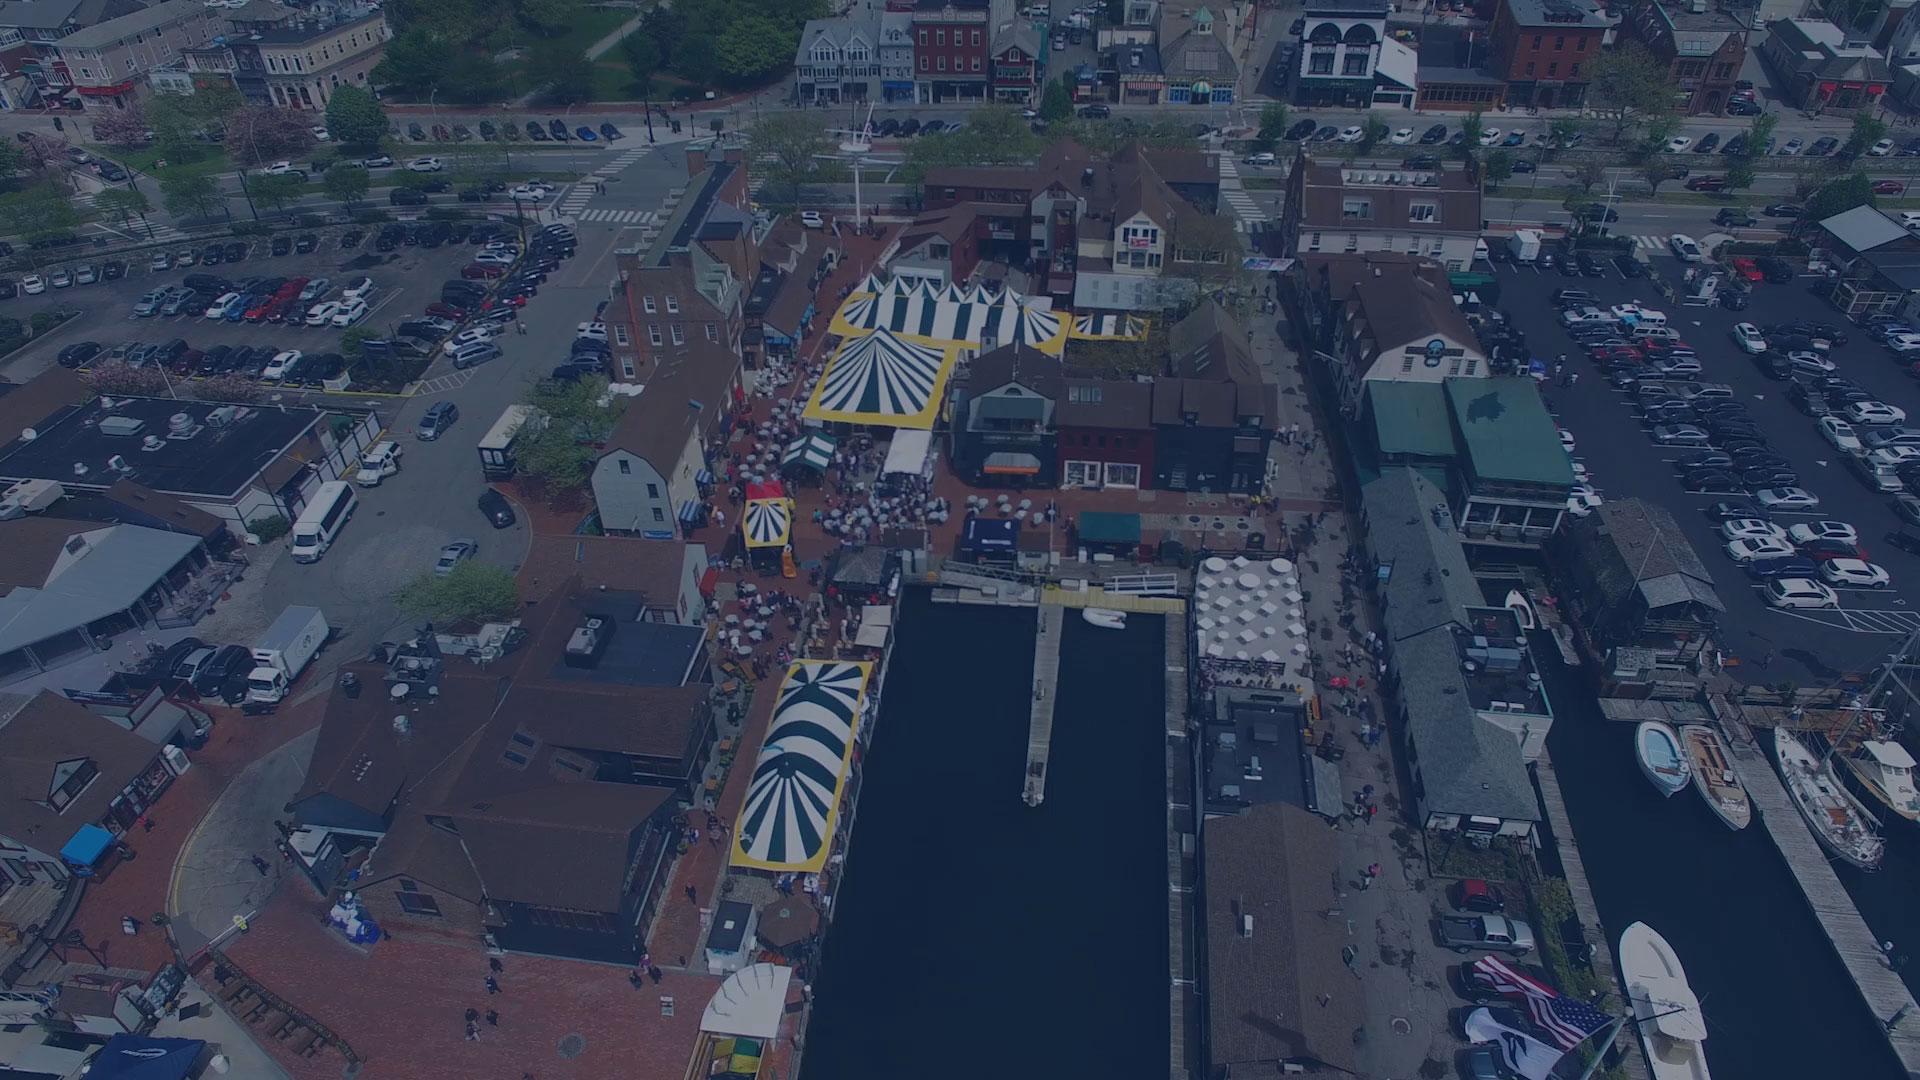 Bowens Wharf Oyster Festival